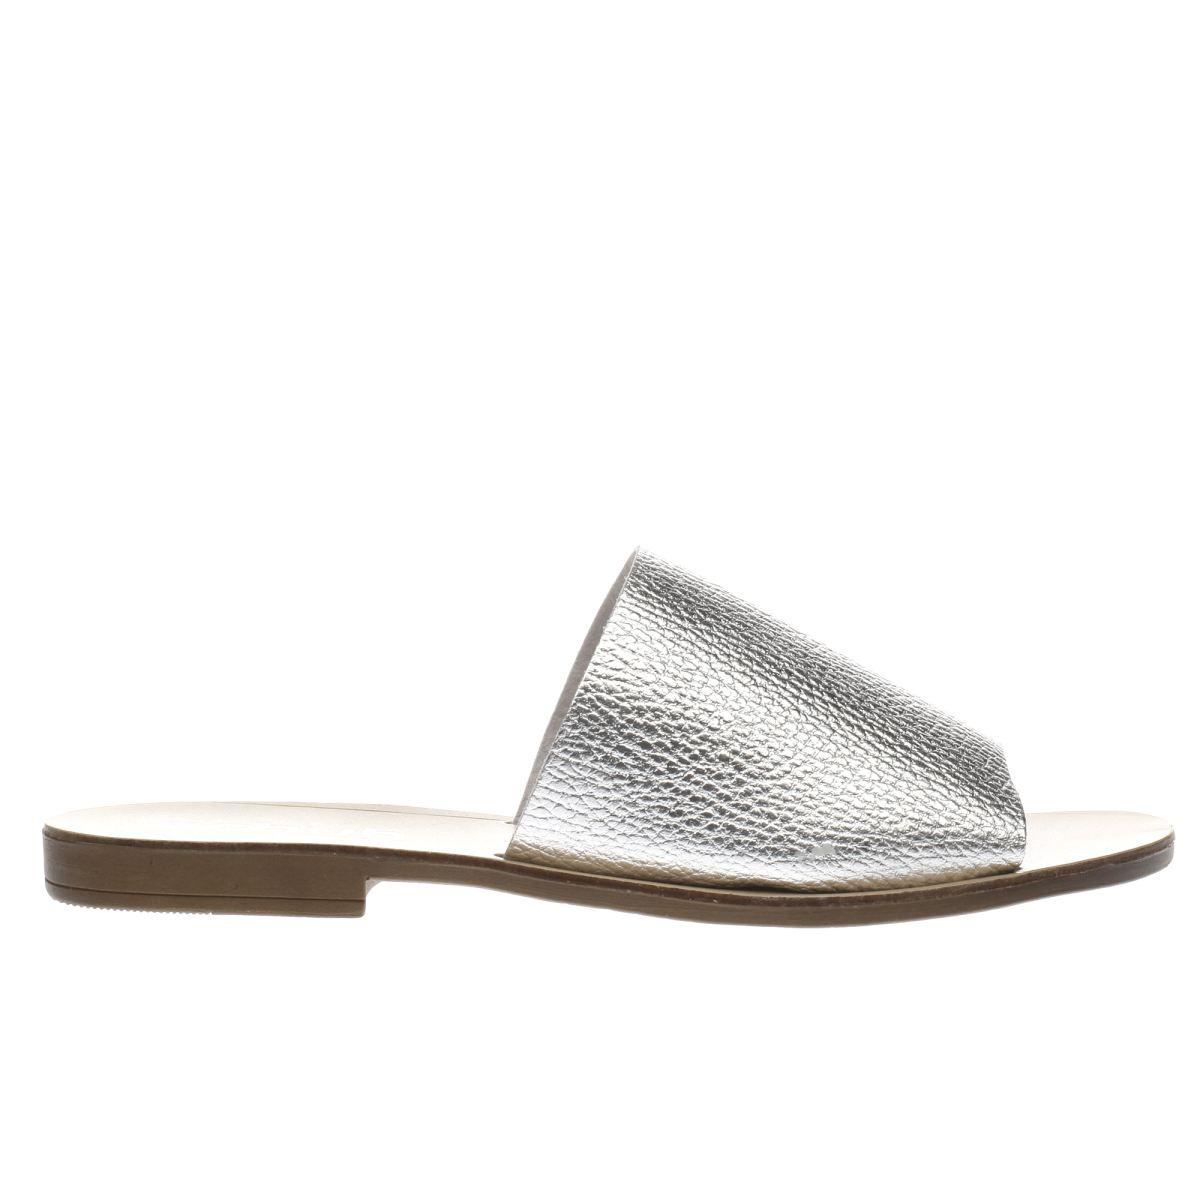 schuh silver bali sandals